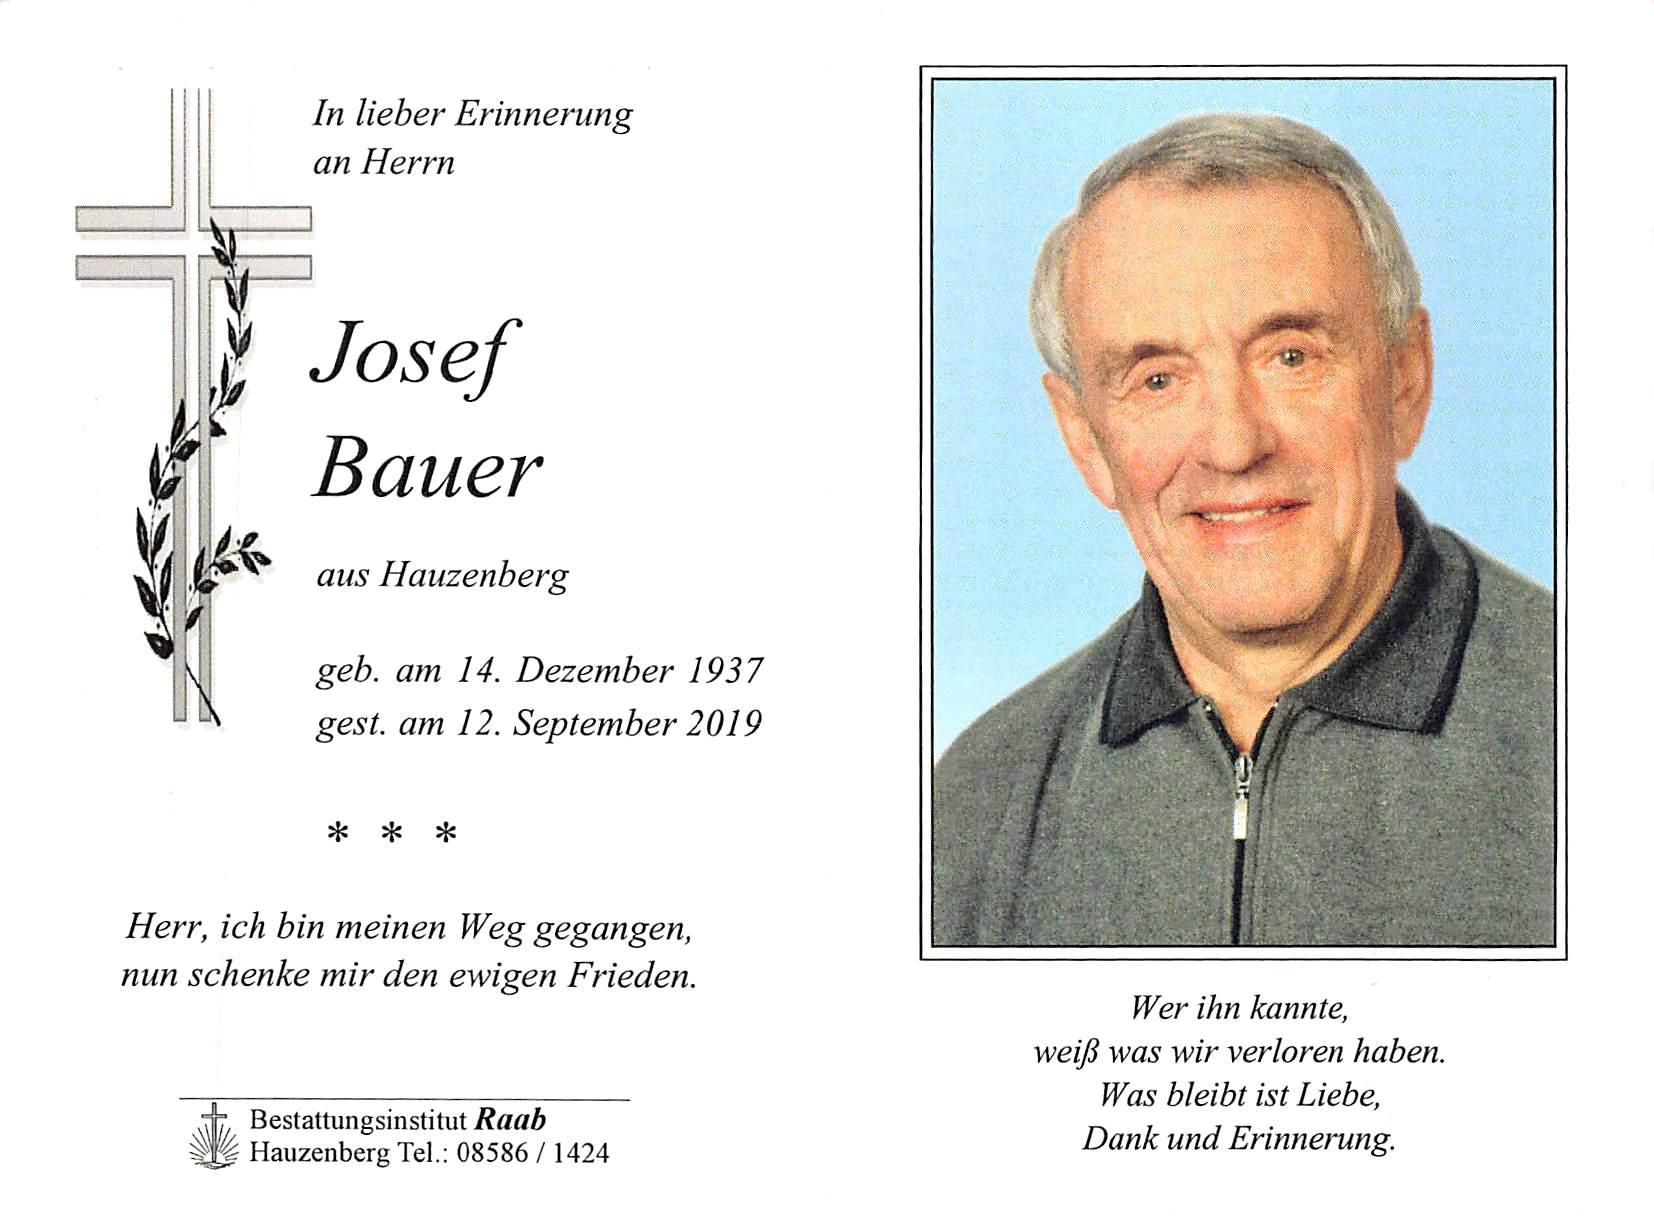 2019-09-12-Bauer-Josef-Hauzenberg